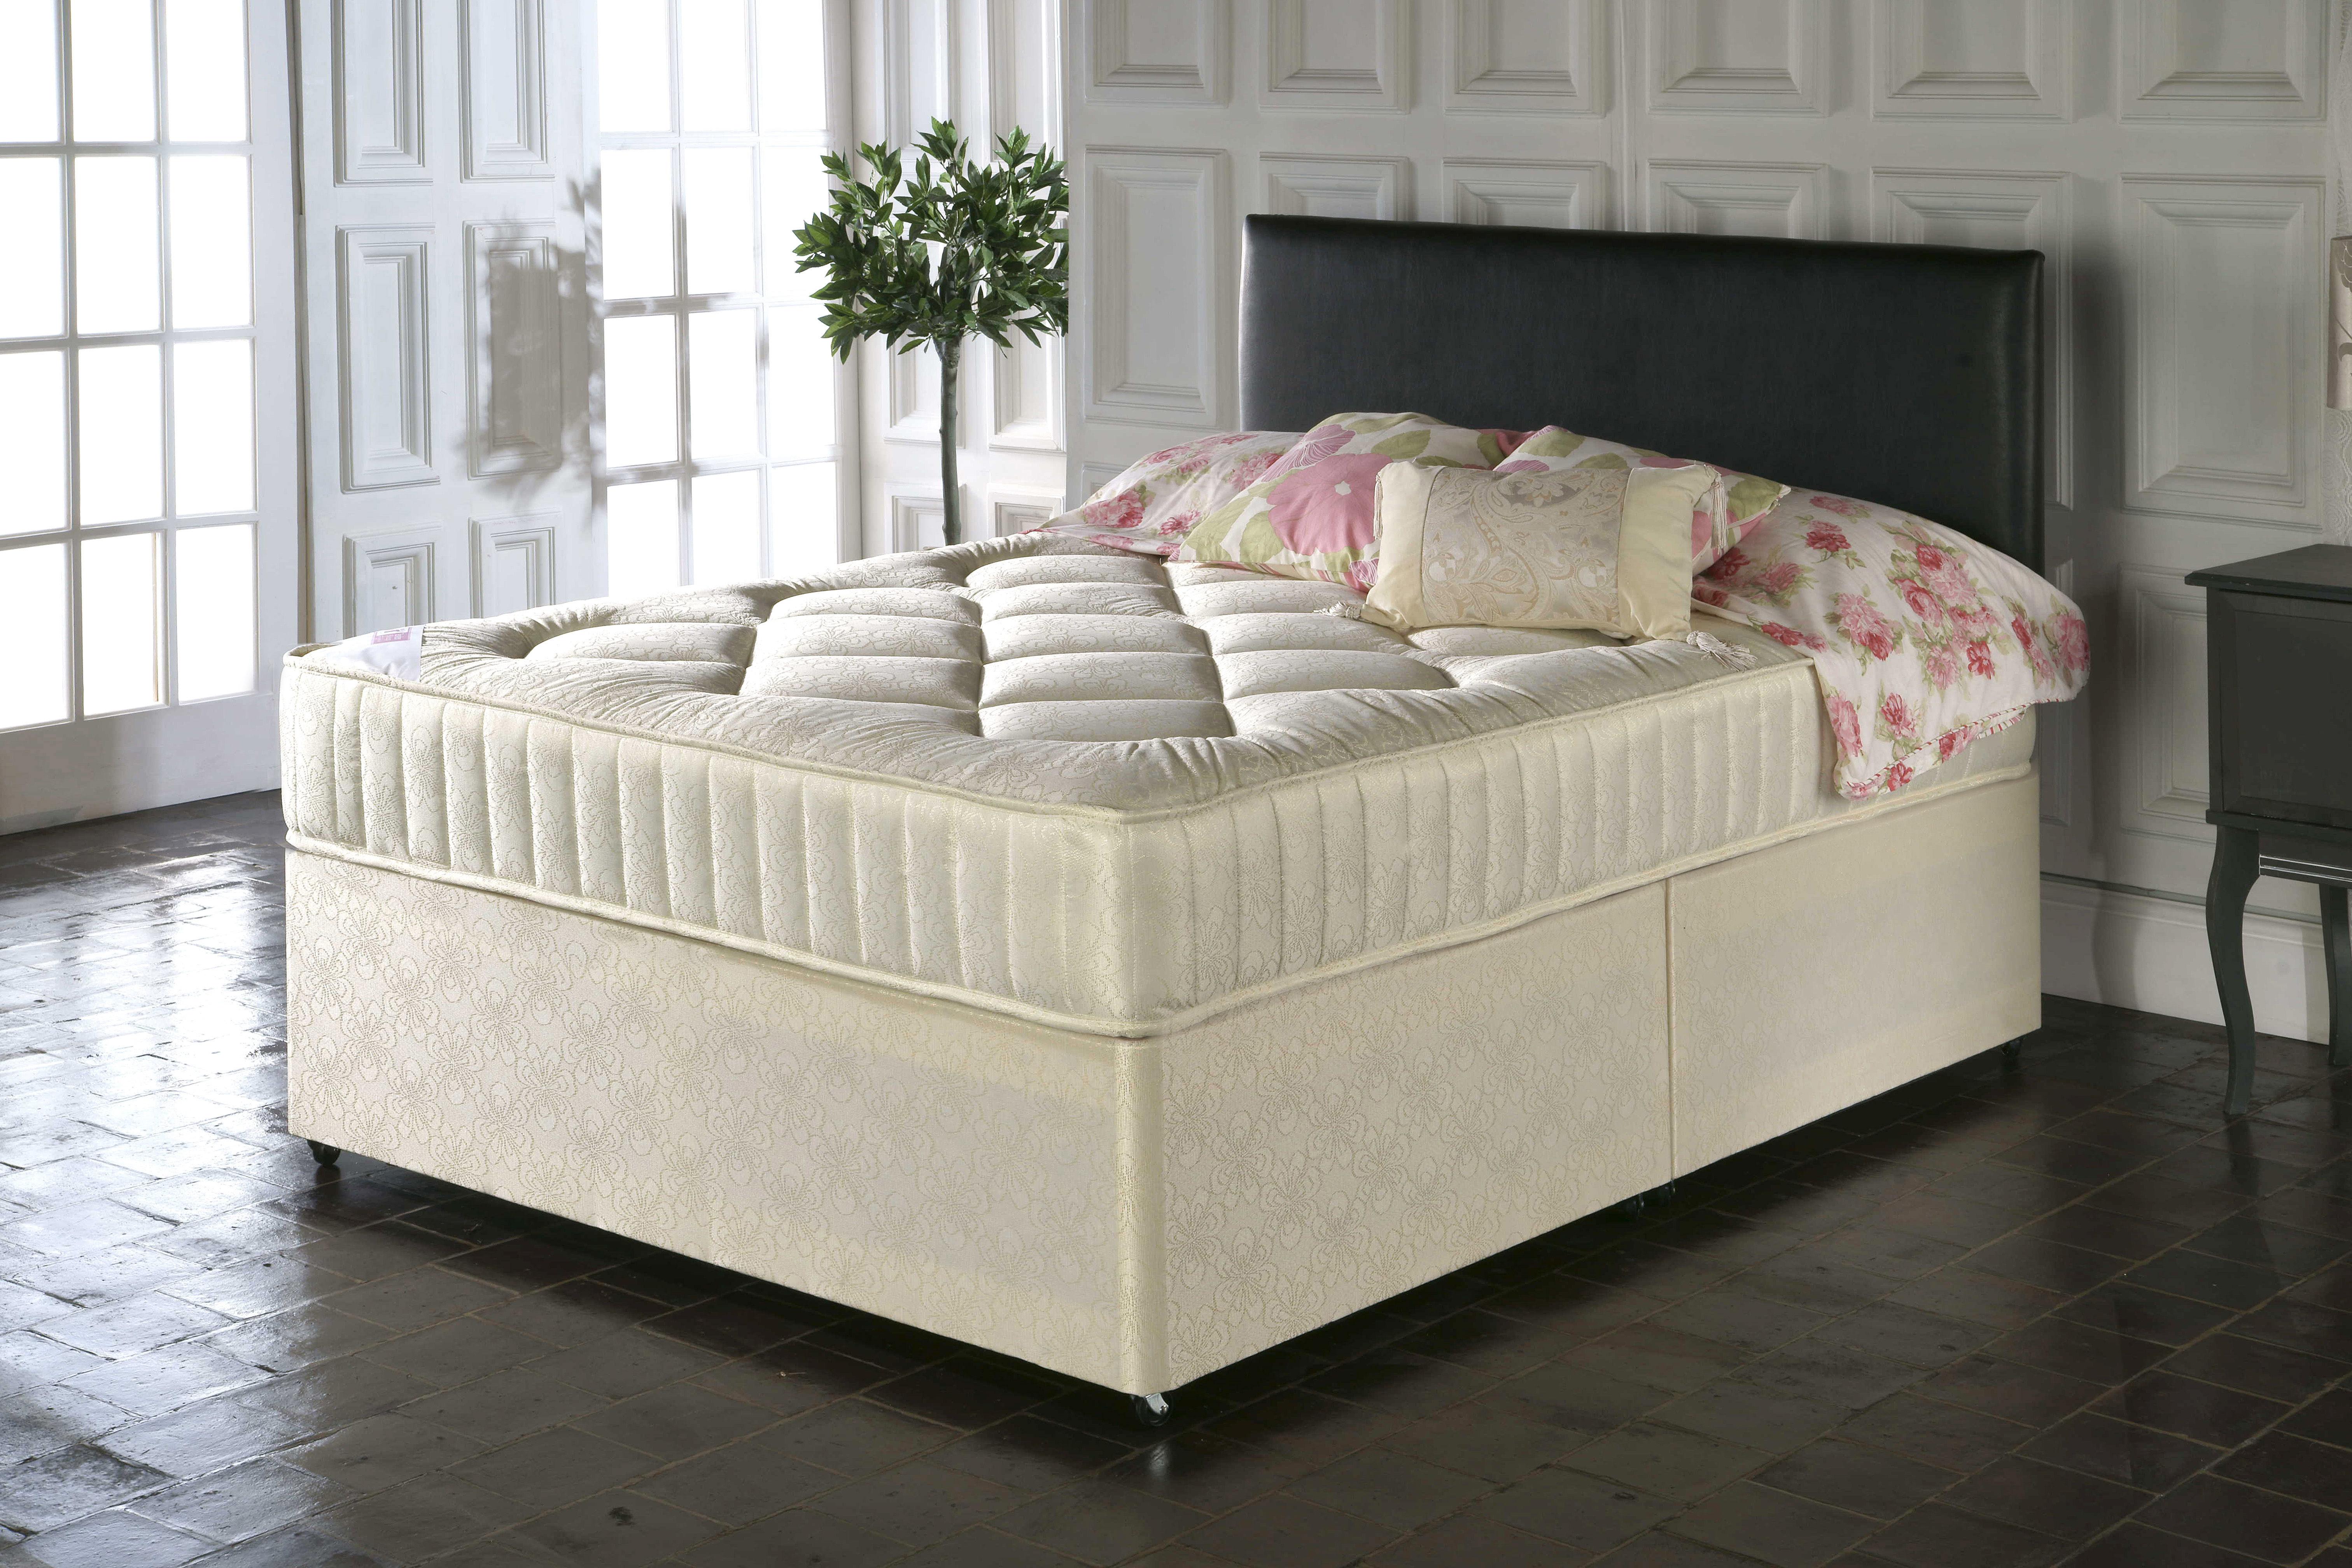 Furniturekraze Ltd Galaxy Orthopaedic Extra Long Bed